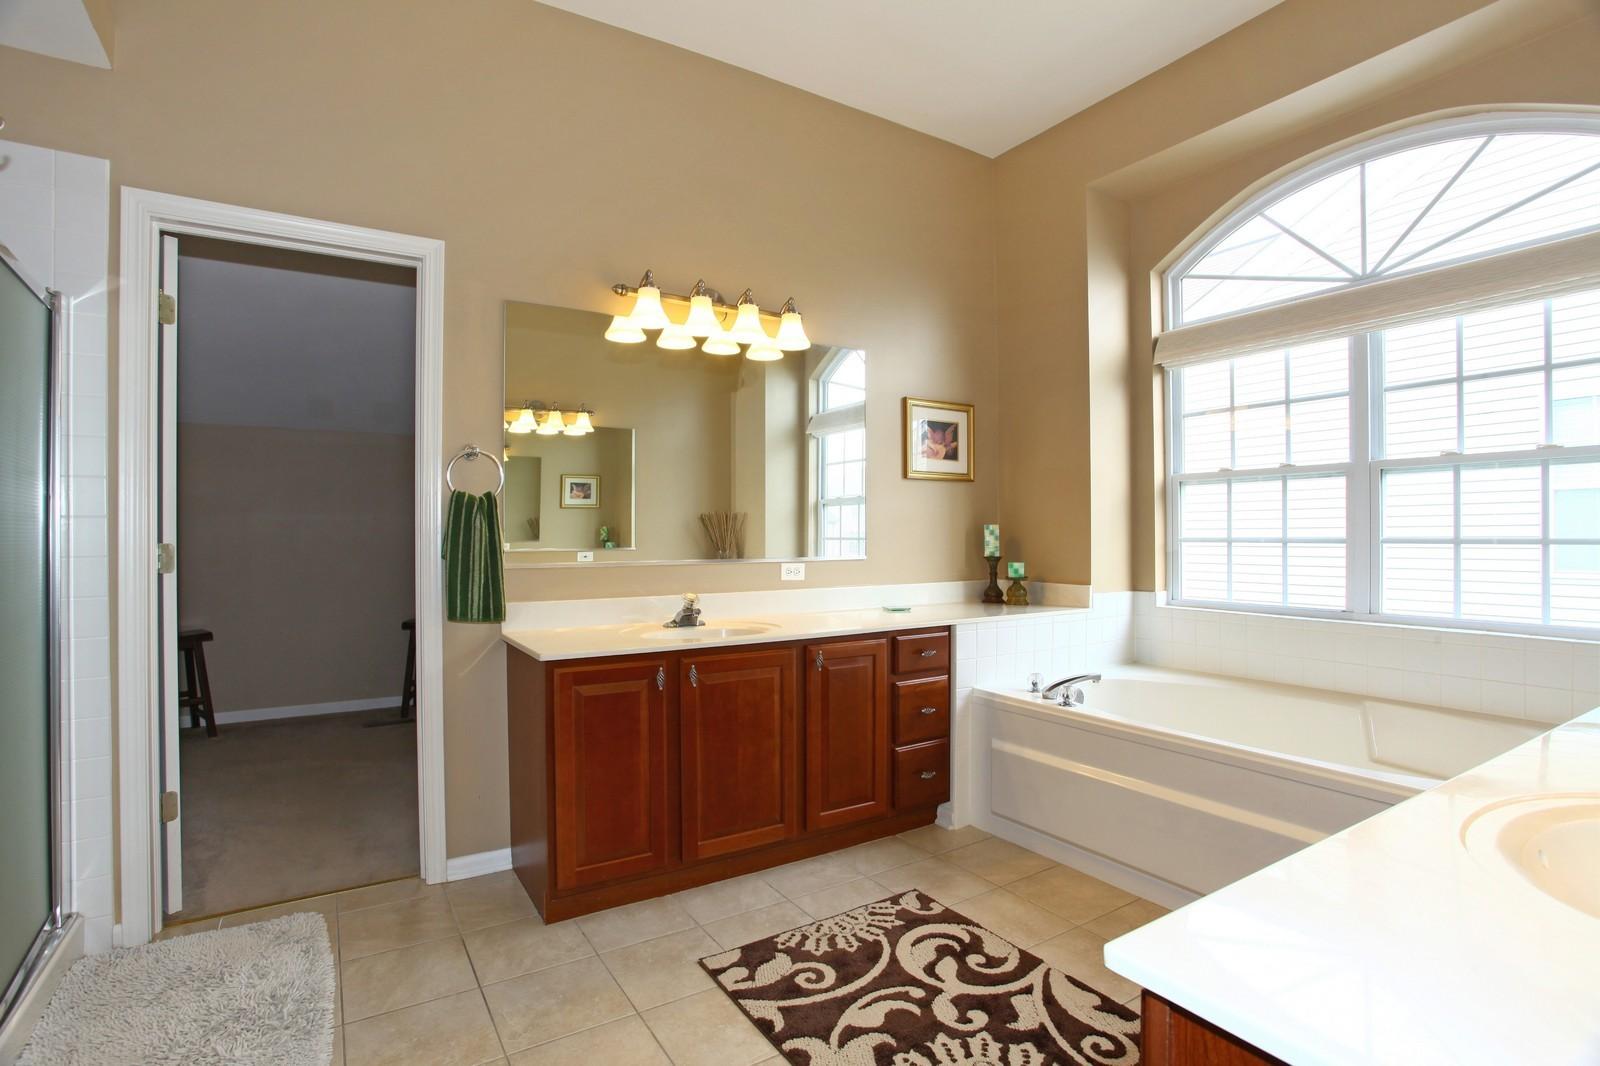 Real Estate Photography - 3298 Fieldstone Dr, Geneva, IL, 60134 - Master Bathroom